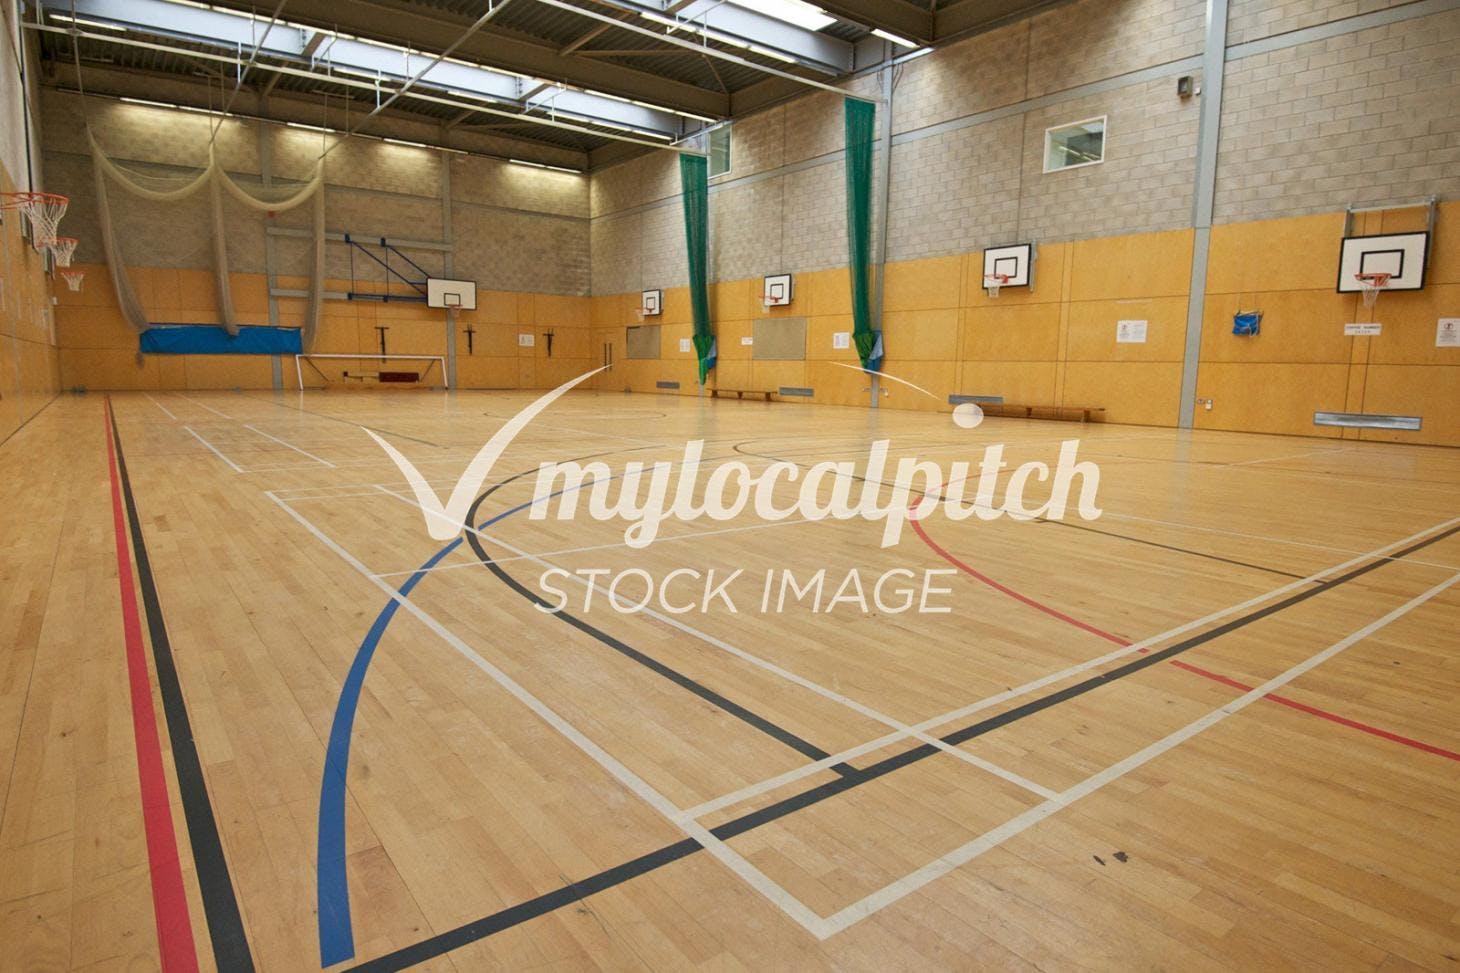 Barking and Dagenham College Indoor basketball court